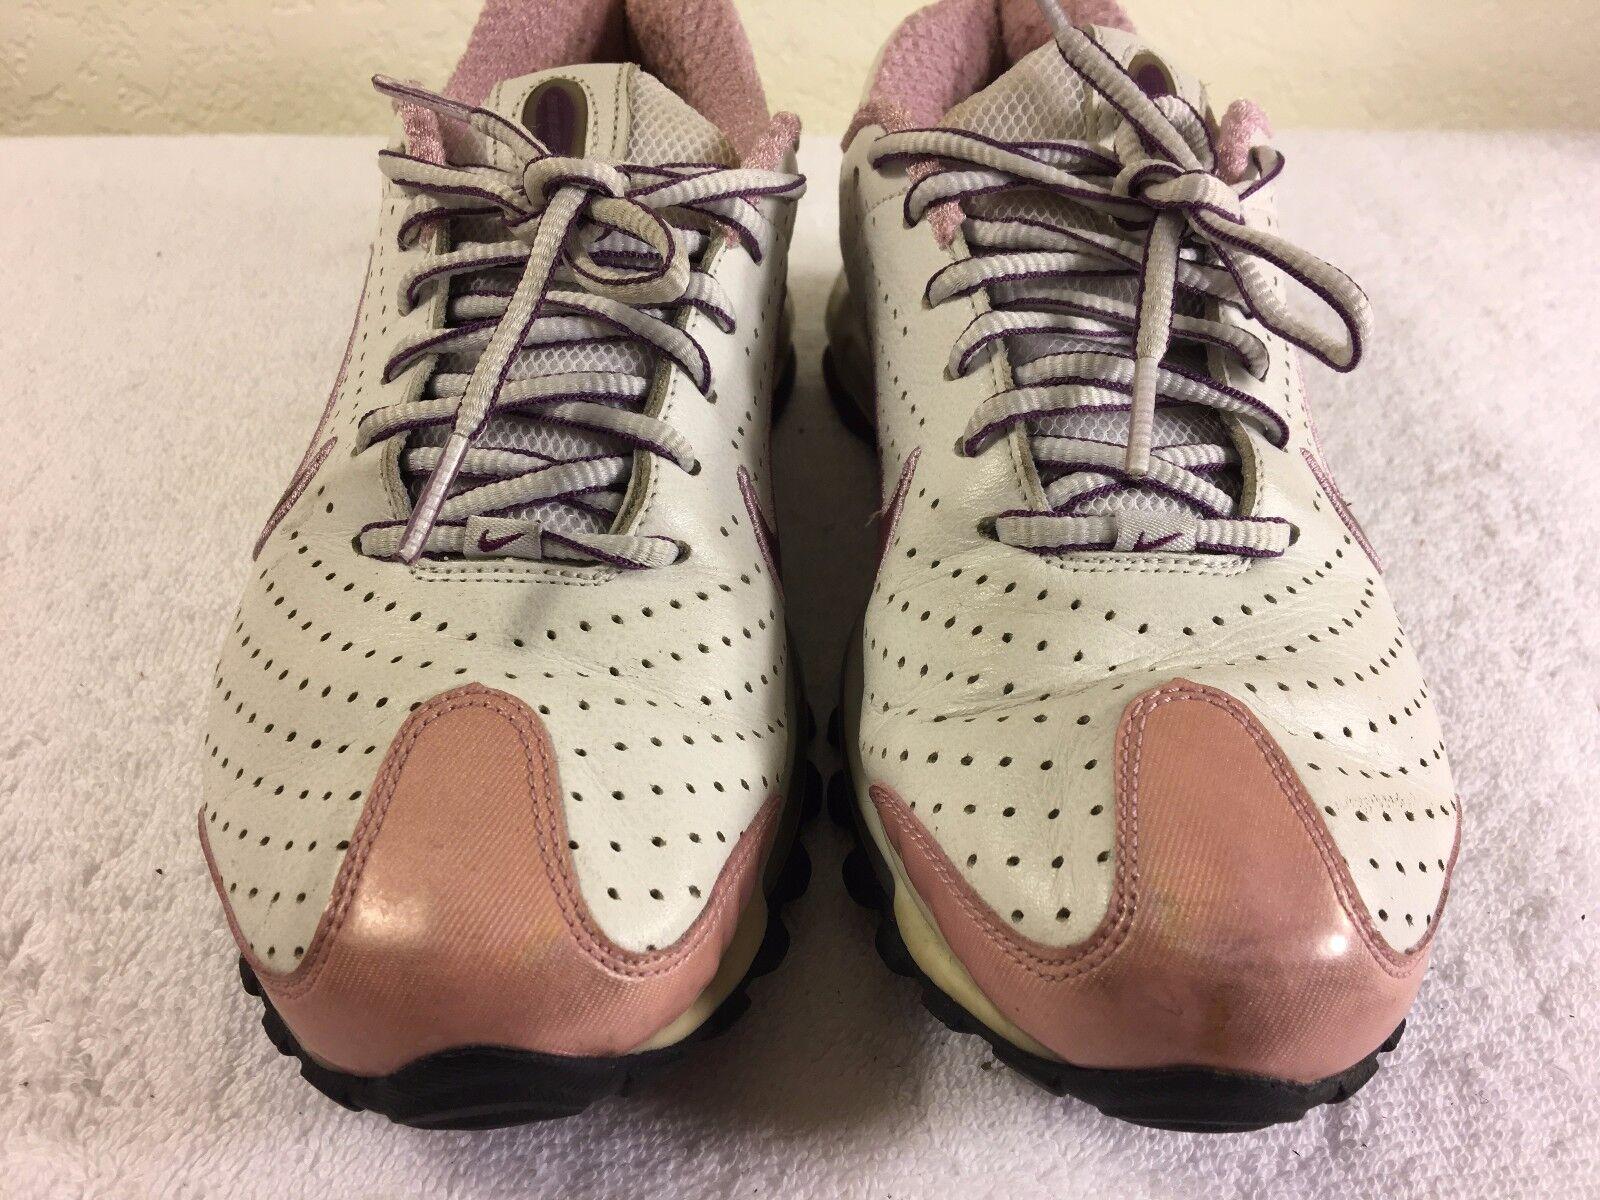 nike air max bianco rosa donne donne scorpe scorpe scorpe 7,5 carino!313387-151! | Stile elegante  | Maschio/Ragazze Scarpa  | Scolaro/Ragazze Scarpa  | Maschio/Ragazze Scarpa  3fefbe